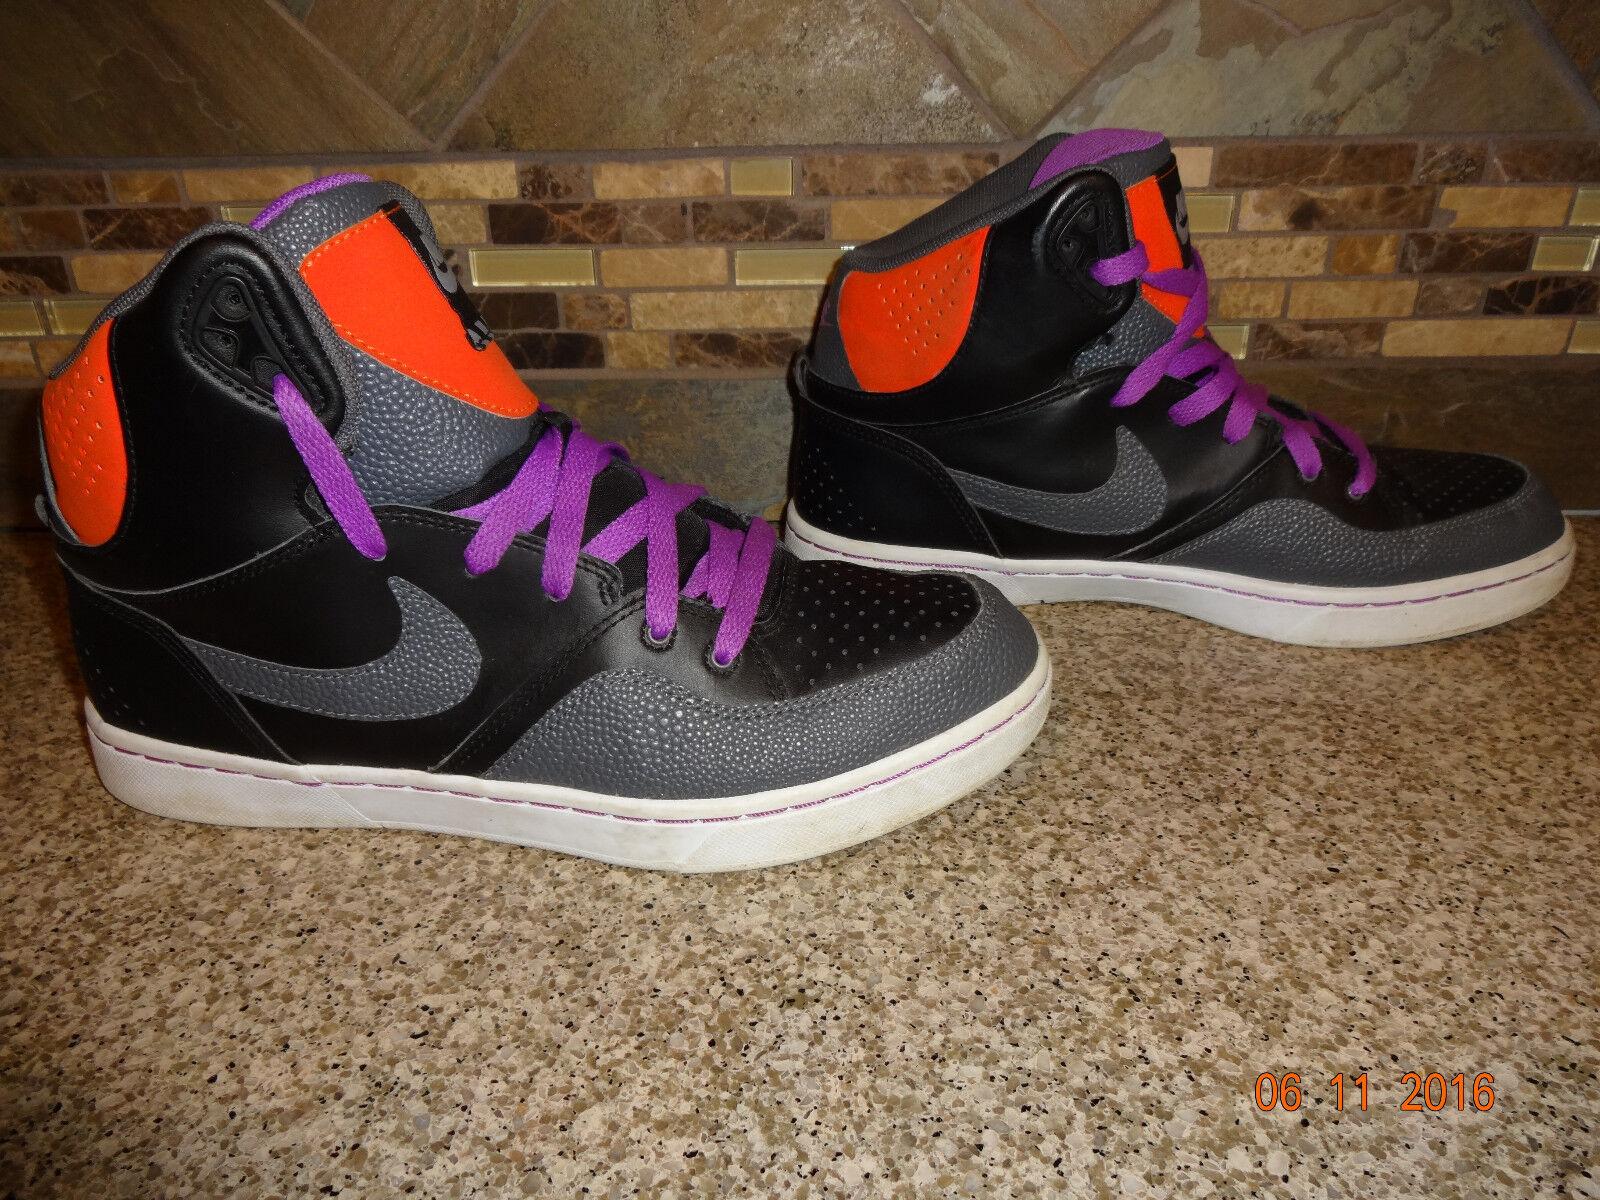 Mens Sz 9 42.5 Nike COURT TRANXITION Basketbal Black/Purple Hi-top Shoes